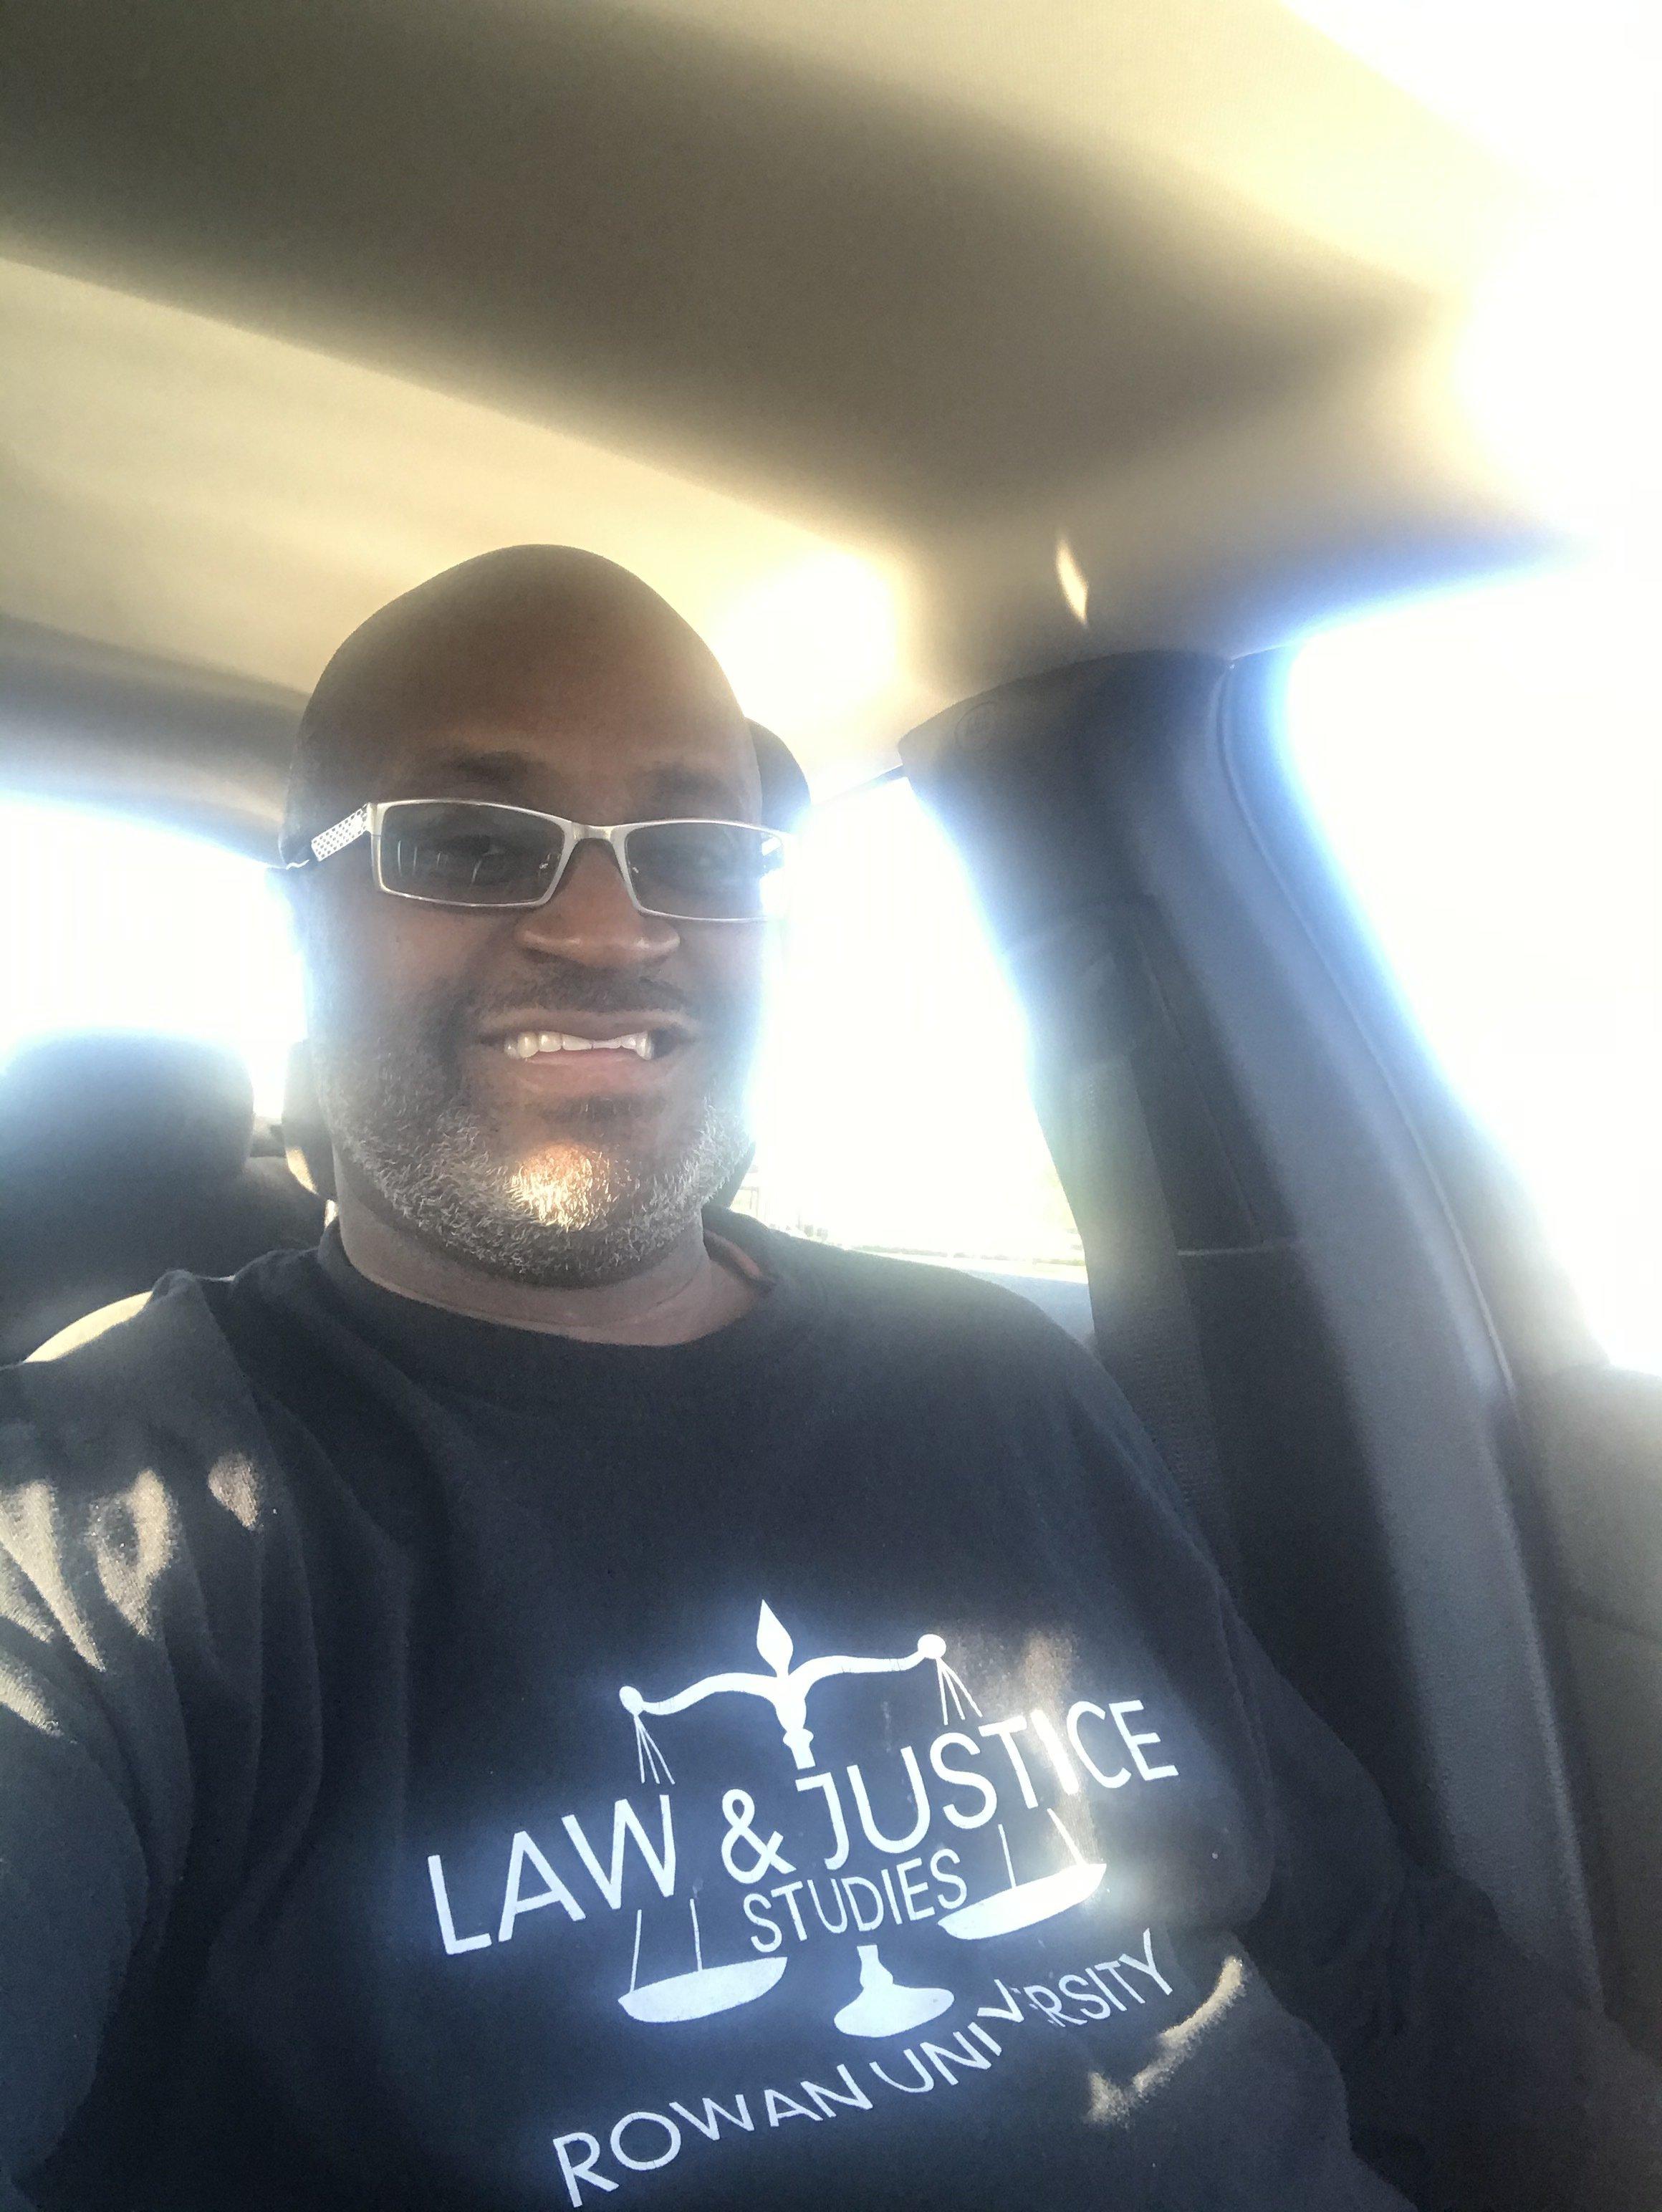 Carl Watkins in a Law & Justice t-shirt.